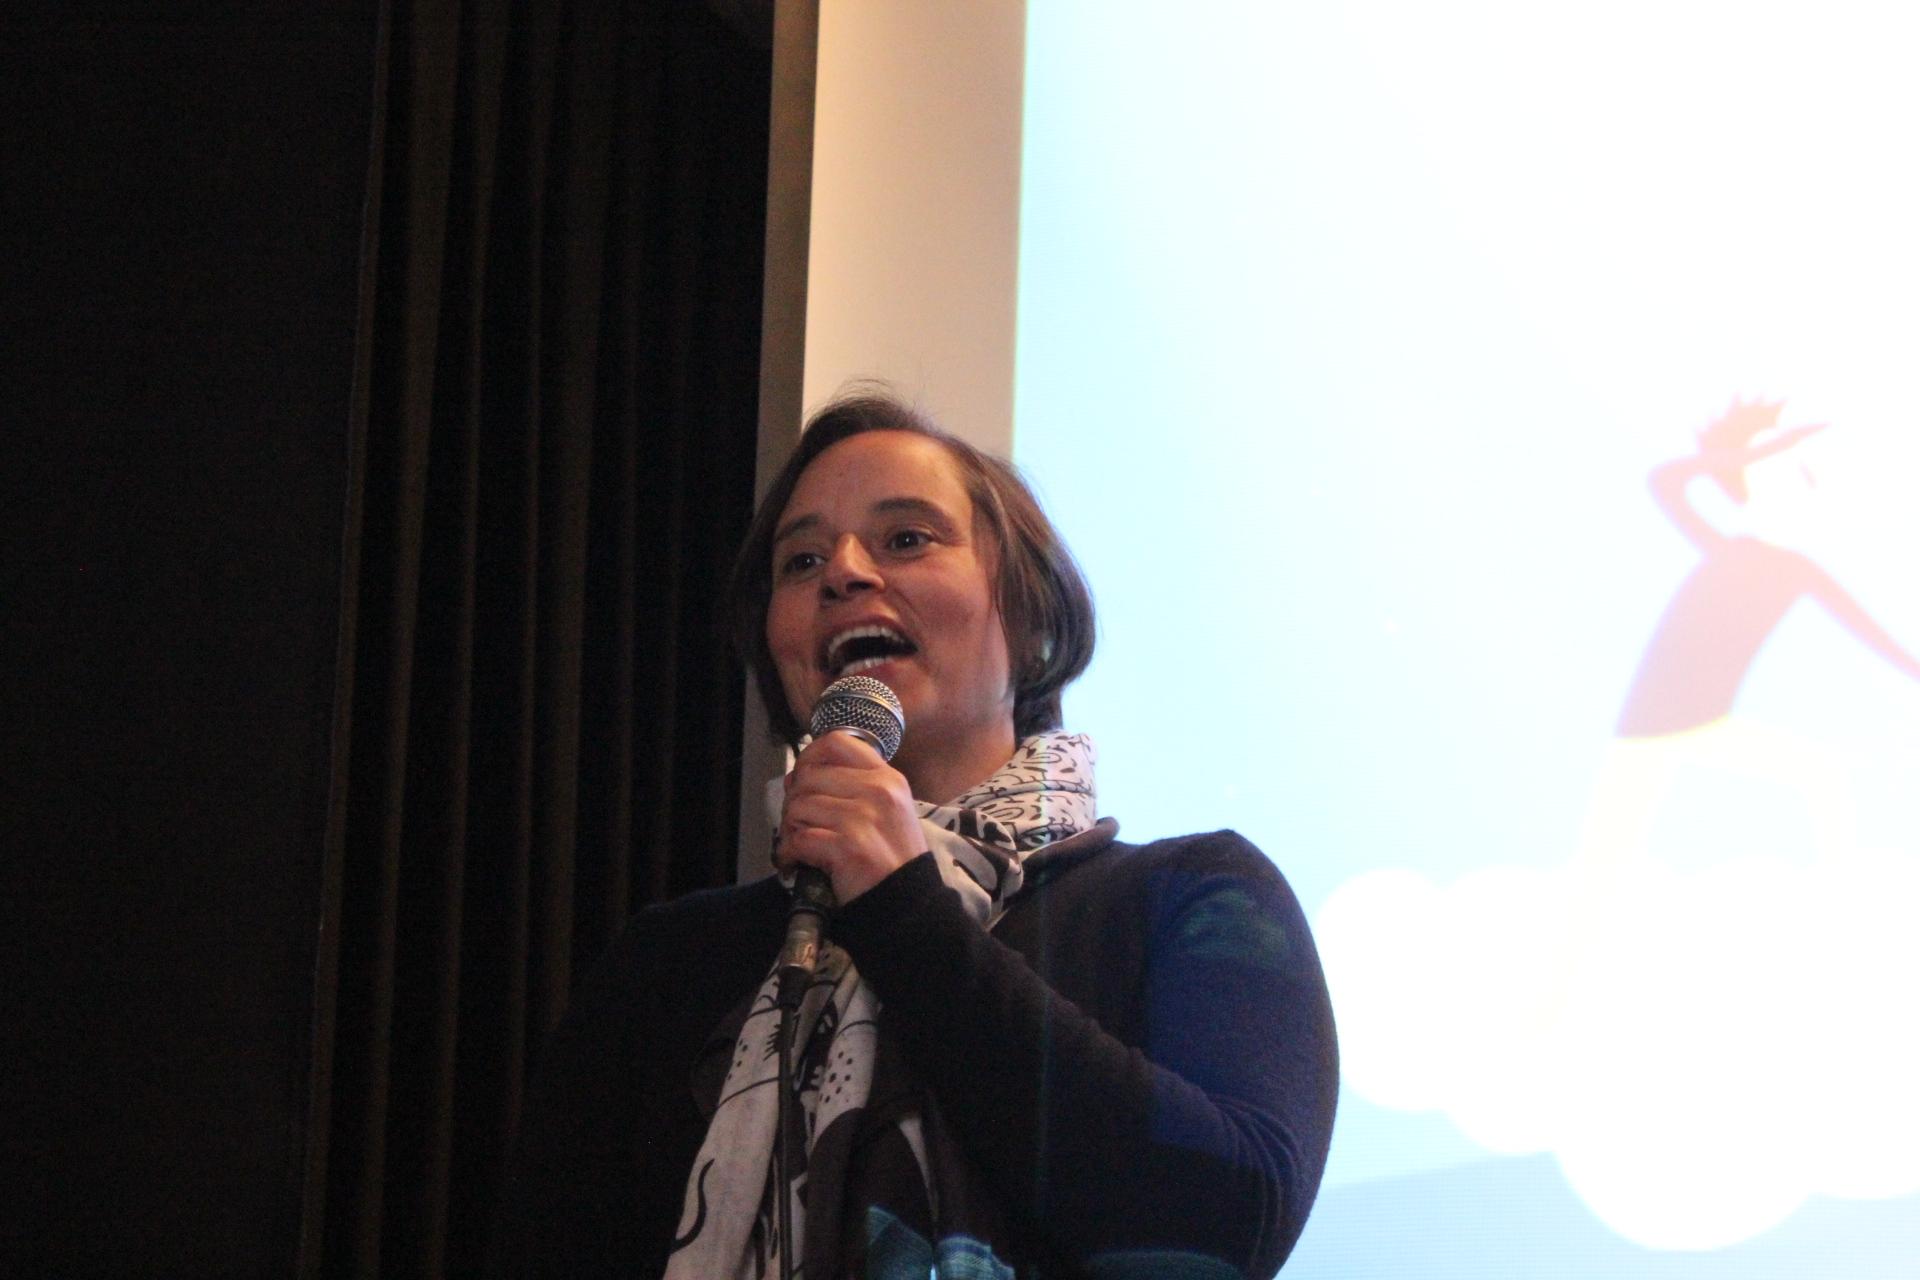 Ximena Nogueira, Directora Regional del Consejo de la Cultura y las Artes de O'Higgins